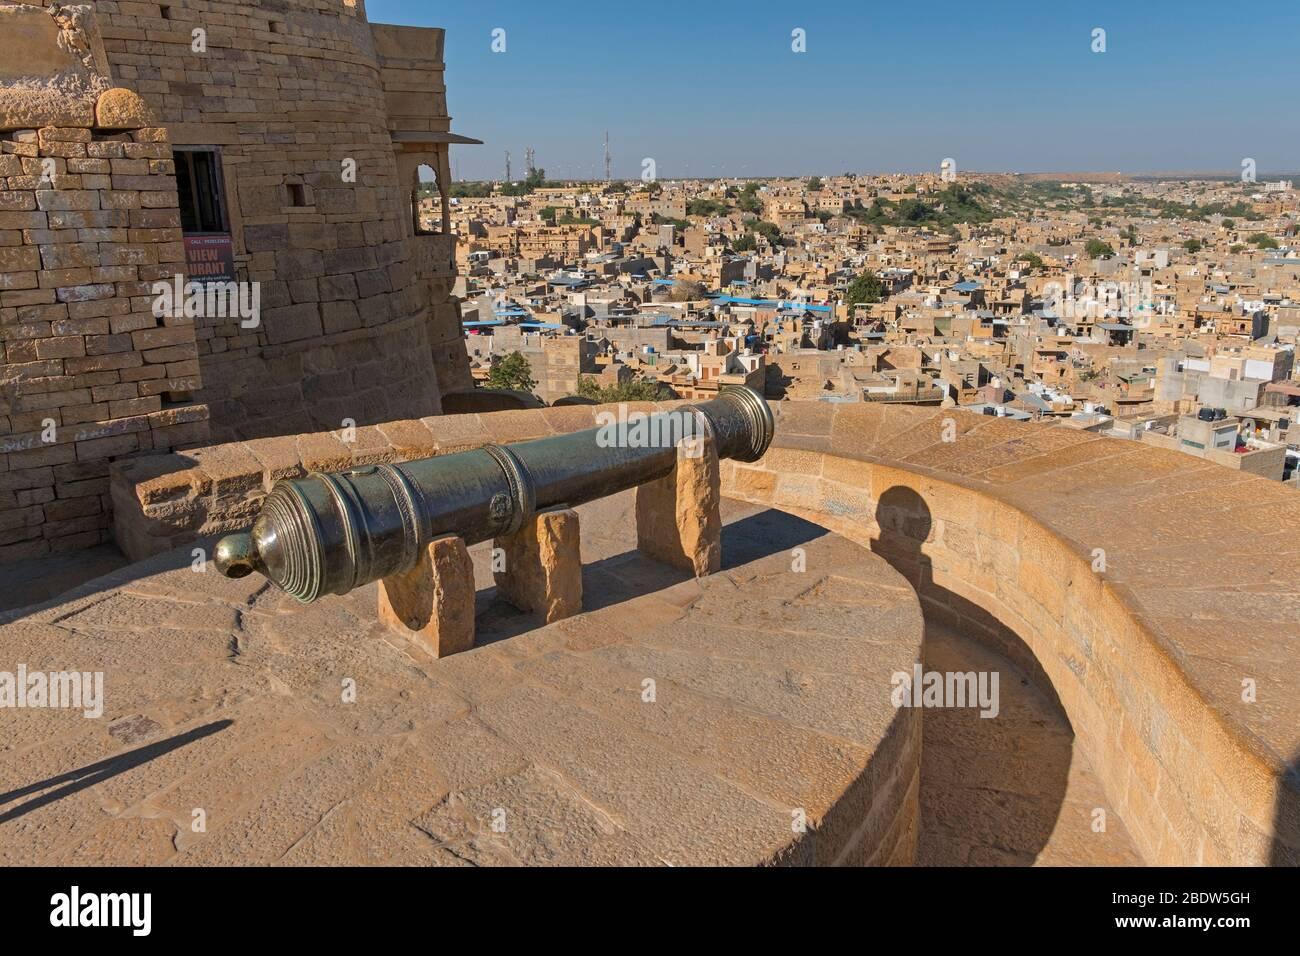 Cannon point vue sur la ville Jaisalmer fort Rajasthan Inde Banque D'Images